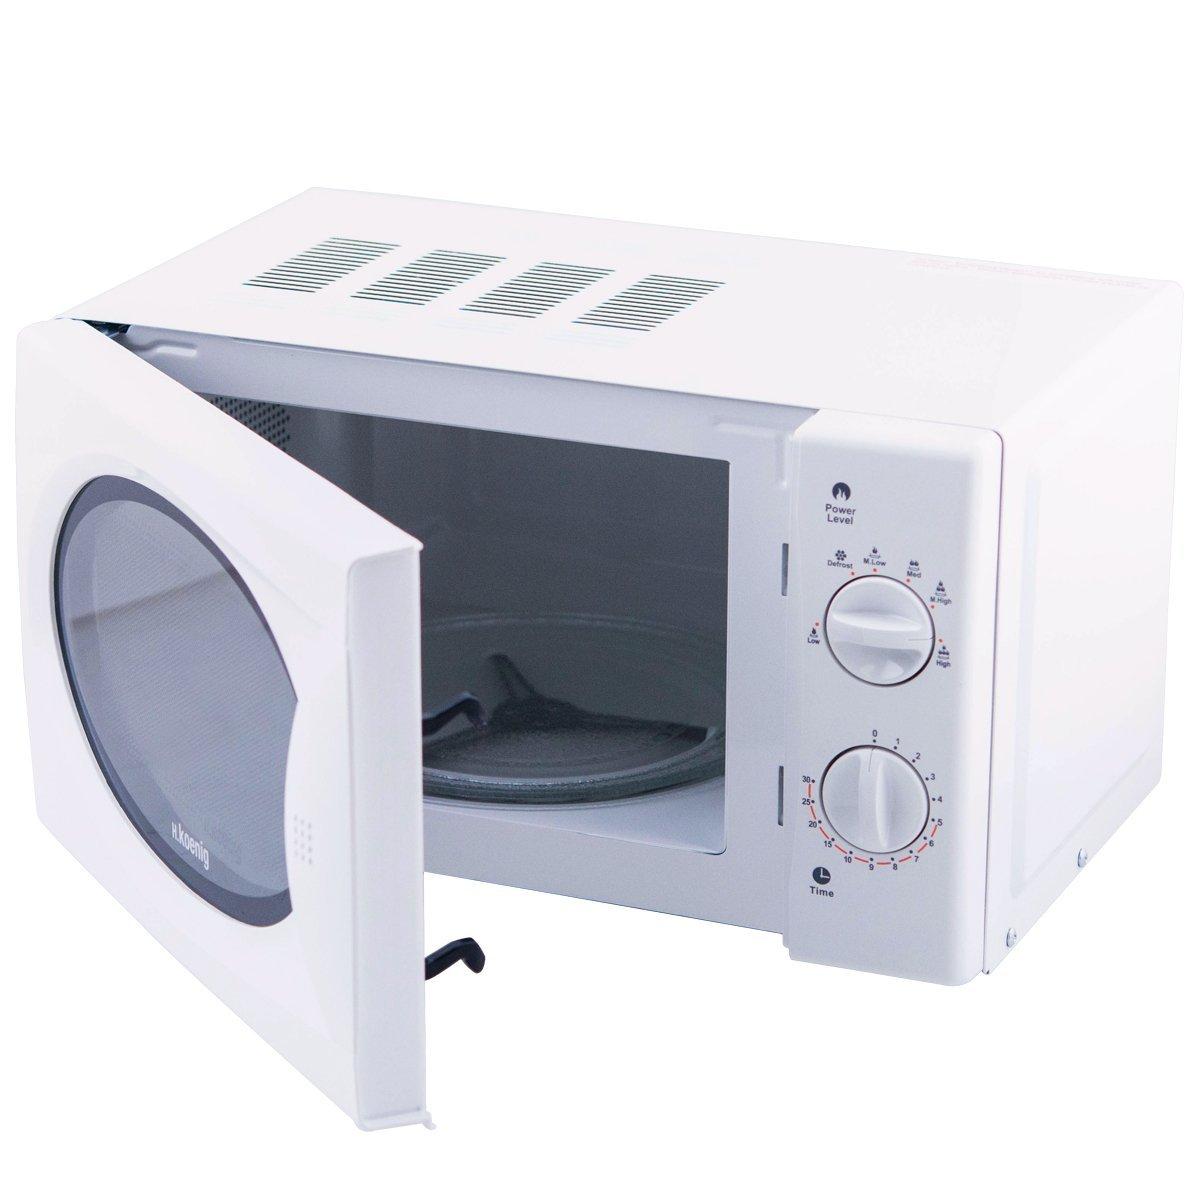 H.Koenig VIO6 micro-ondes